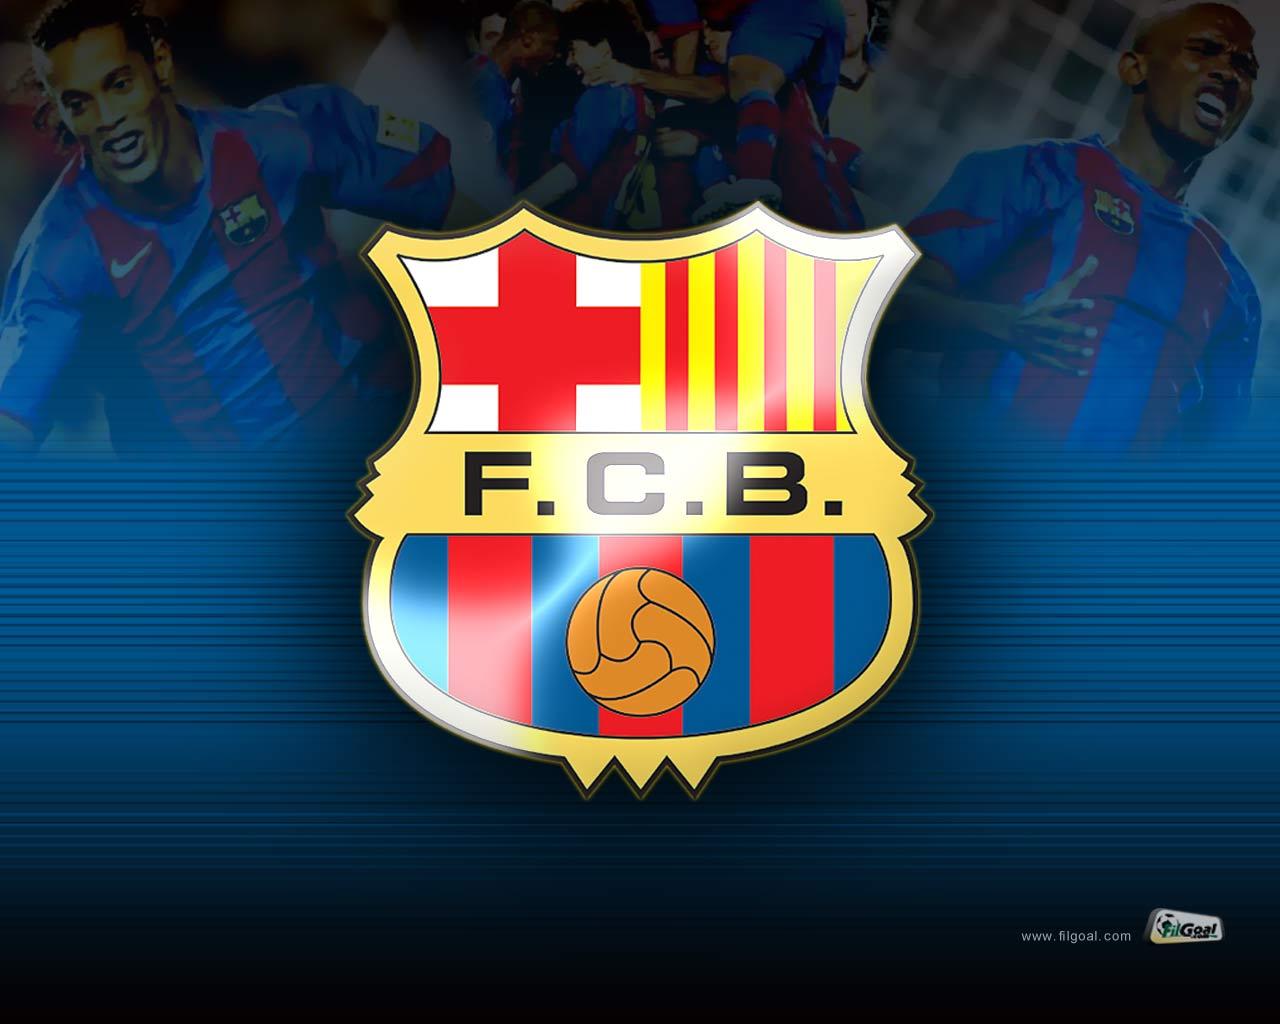 Barcelona Calendar Wallpaper : Barcelona dream league soccer home kit search results